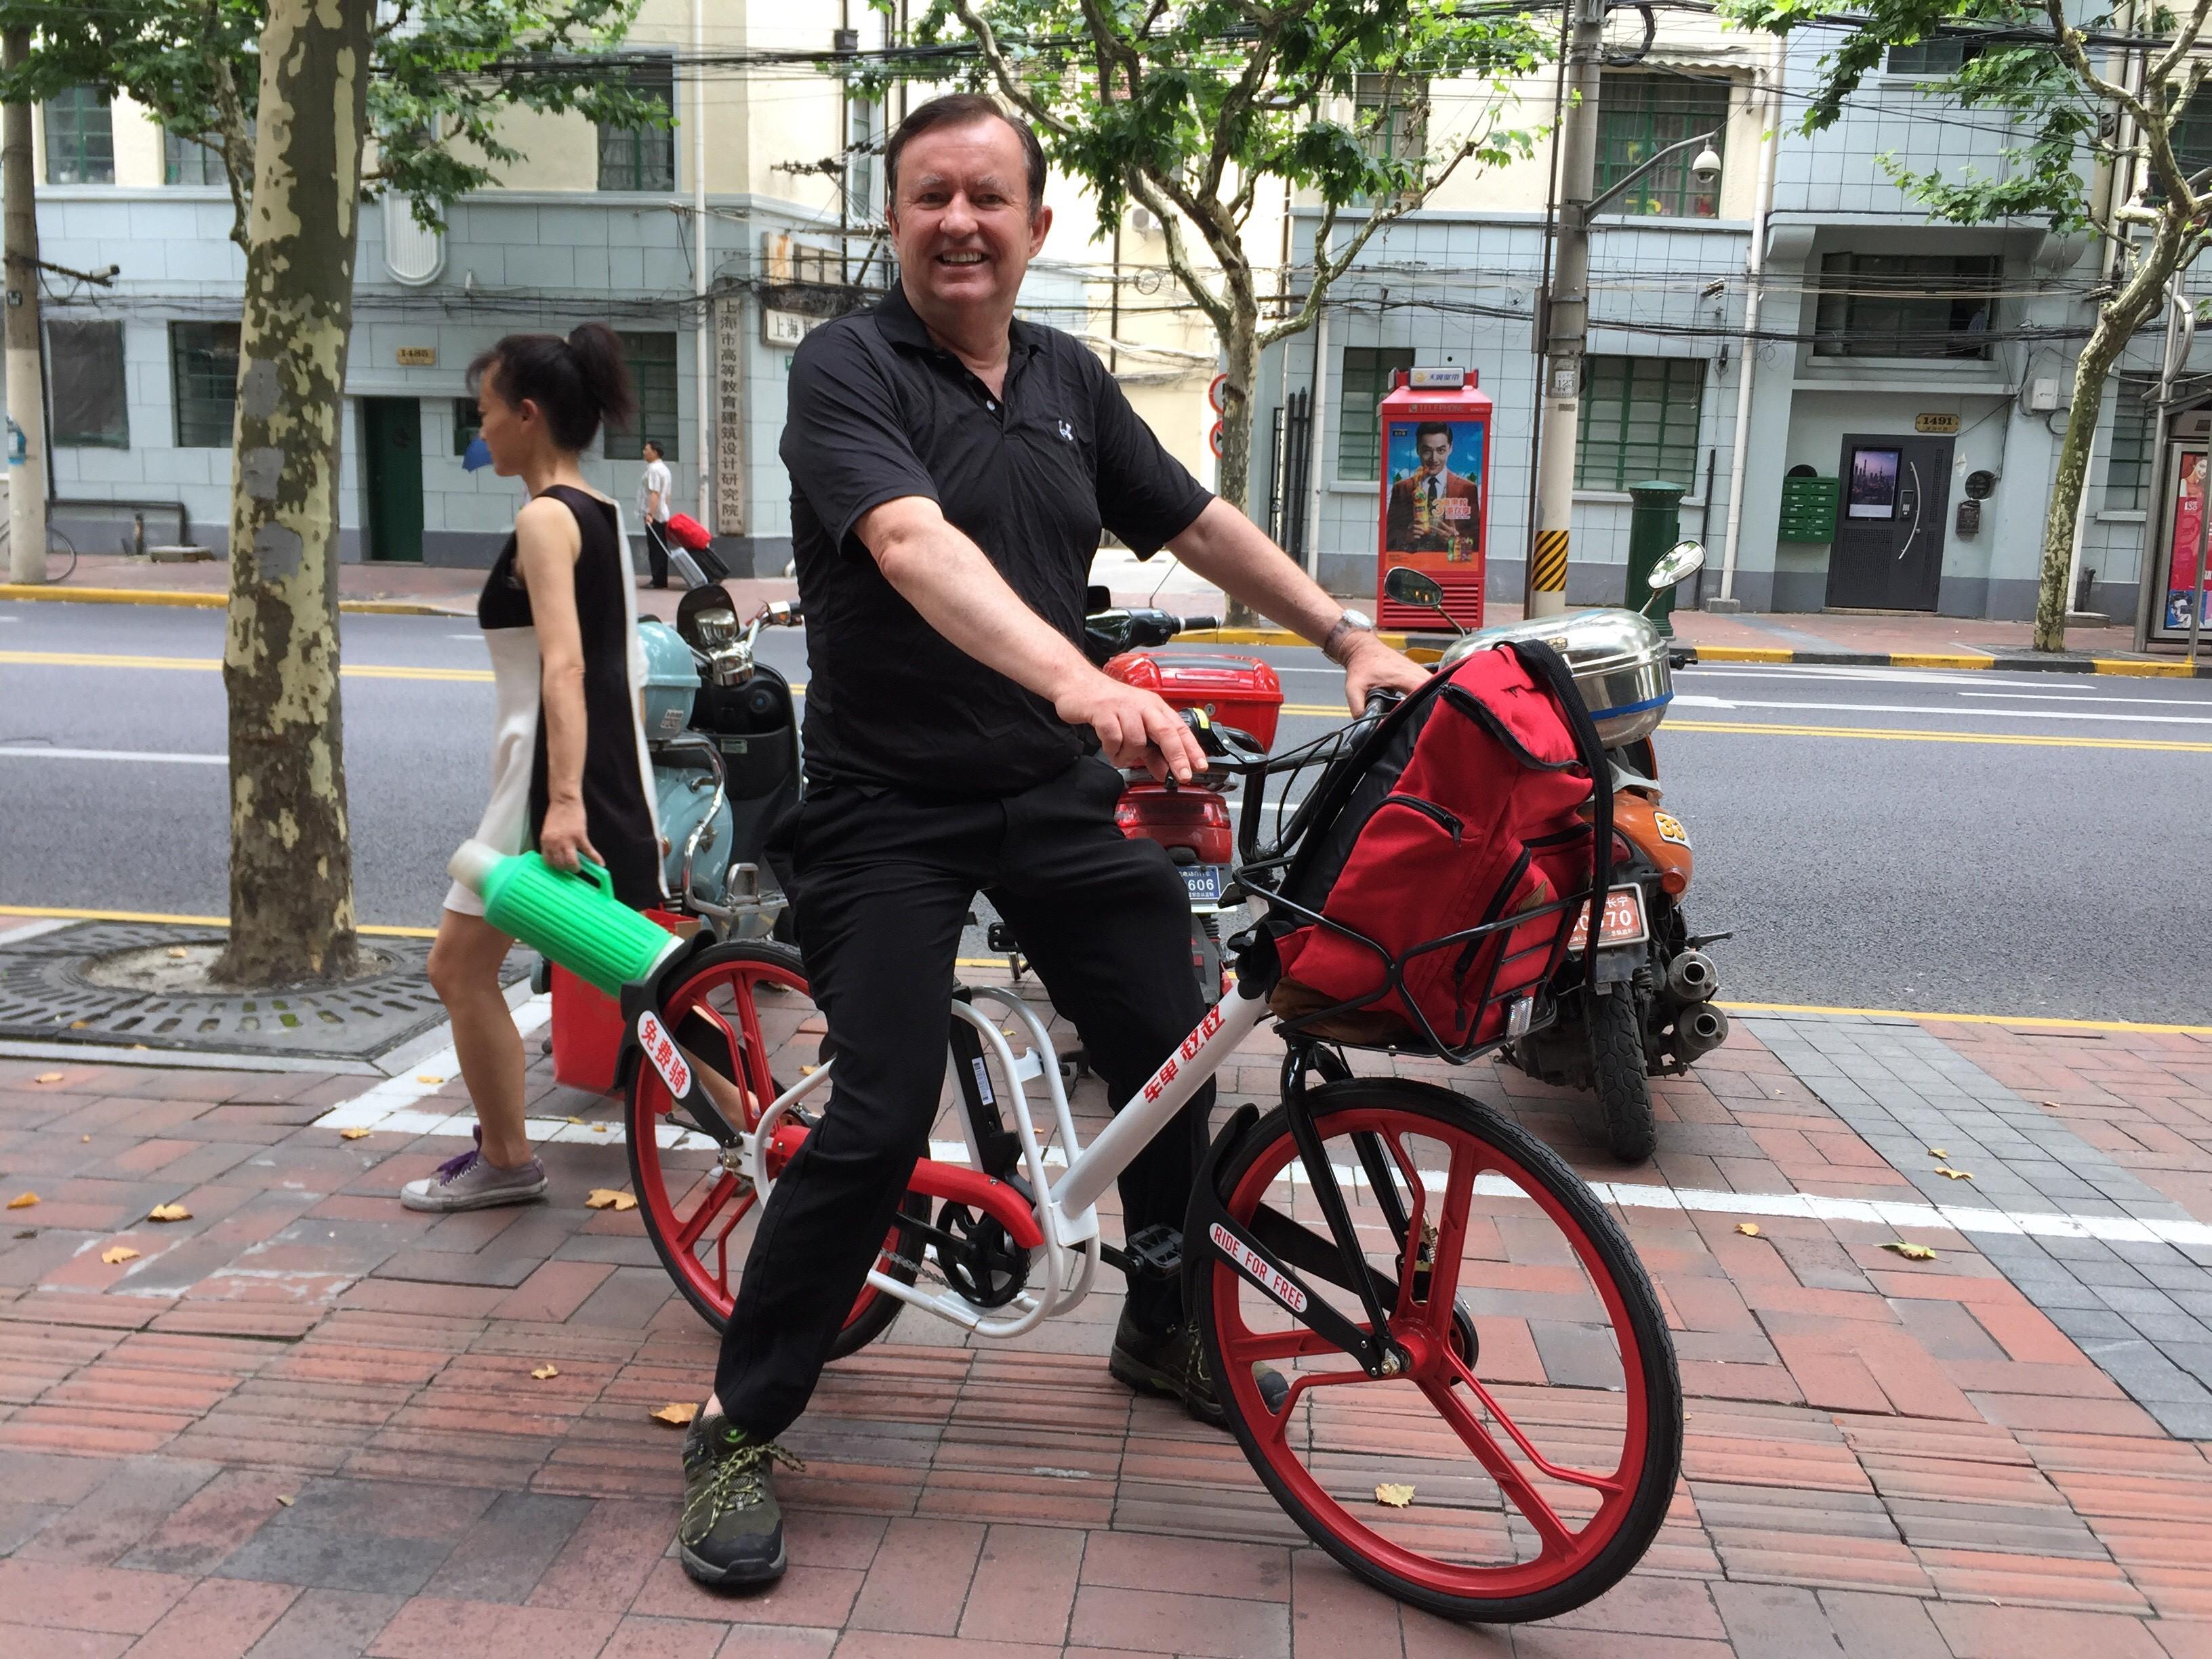 CAPAStudyAbroad_Shanghai_Summer2017_From Colin Speakman on WeChat Bike.jpg